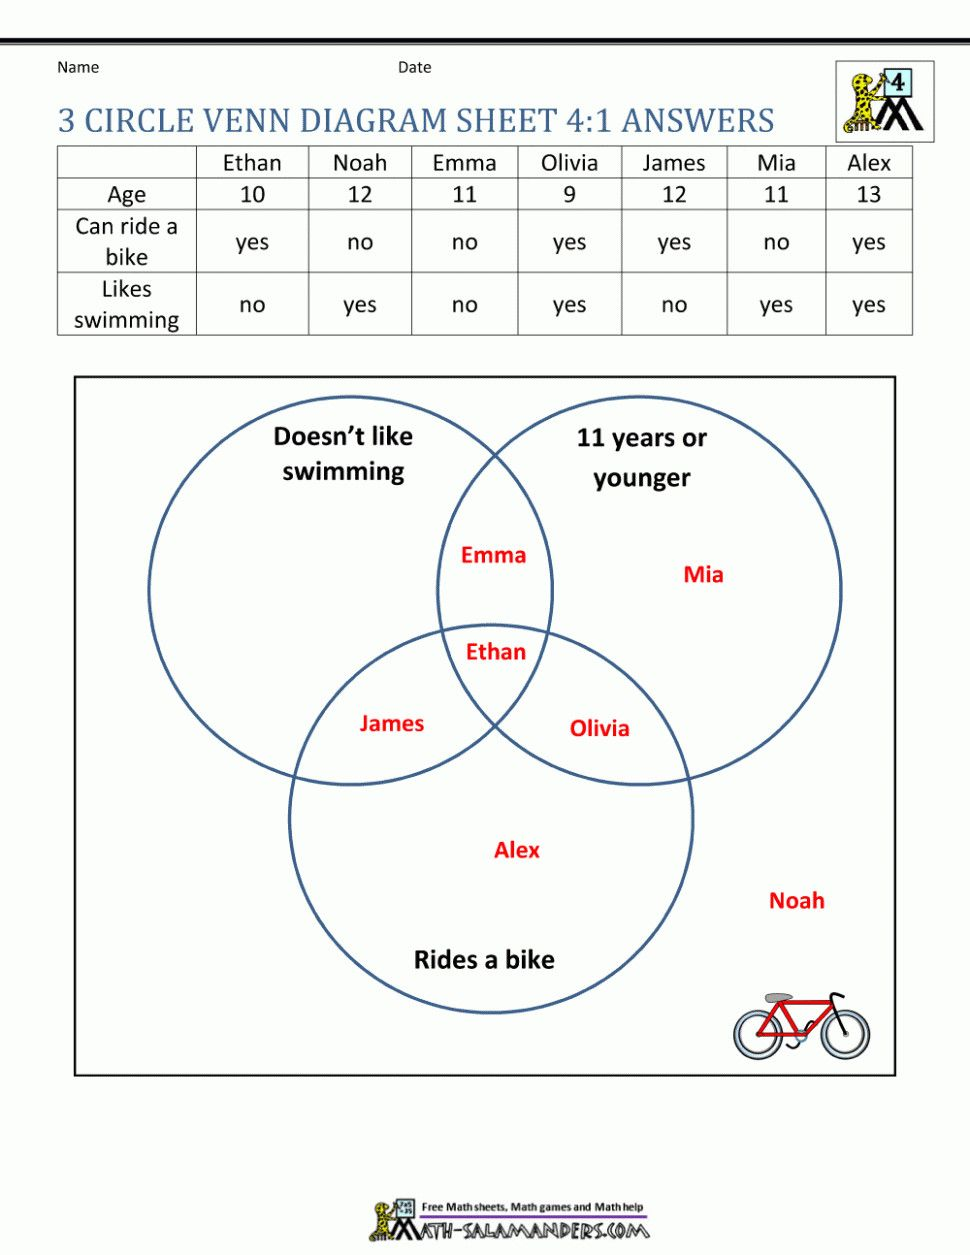 10 Automatic 3 Circle Venn Diagram Maker Design Venn Diagram